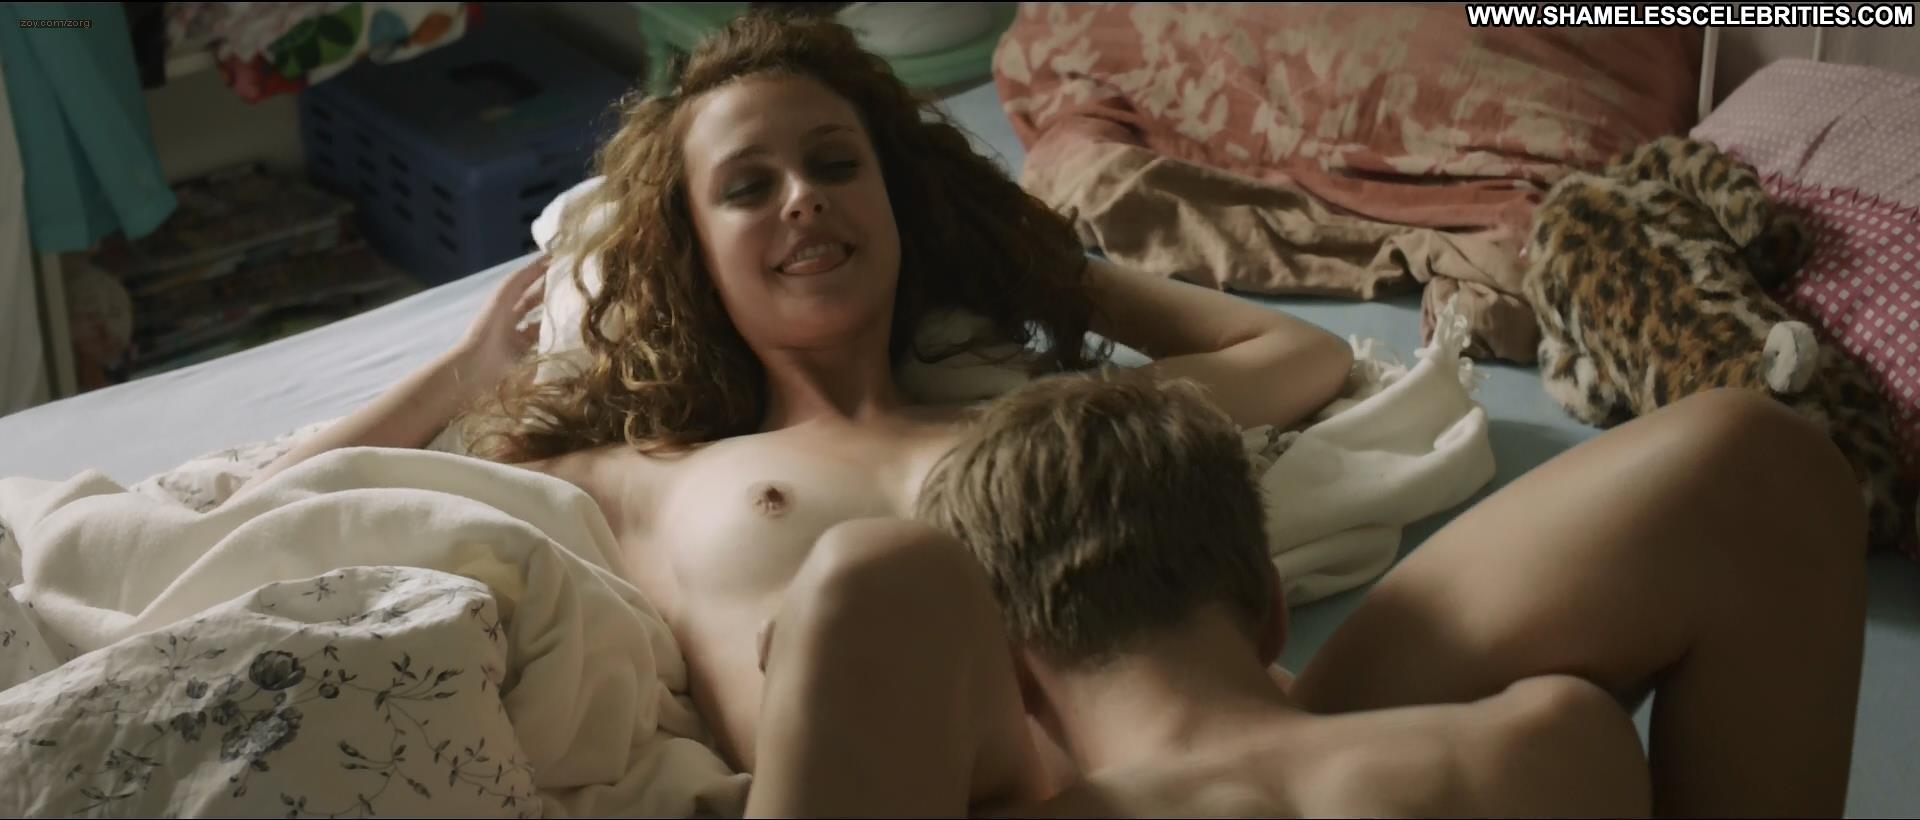 Free Porn Videos Hardcore Adult Sex Movies Porno Hub Tube